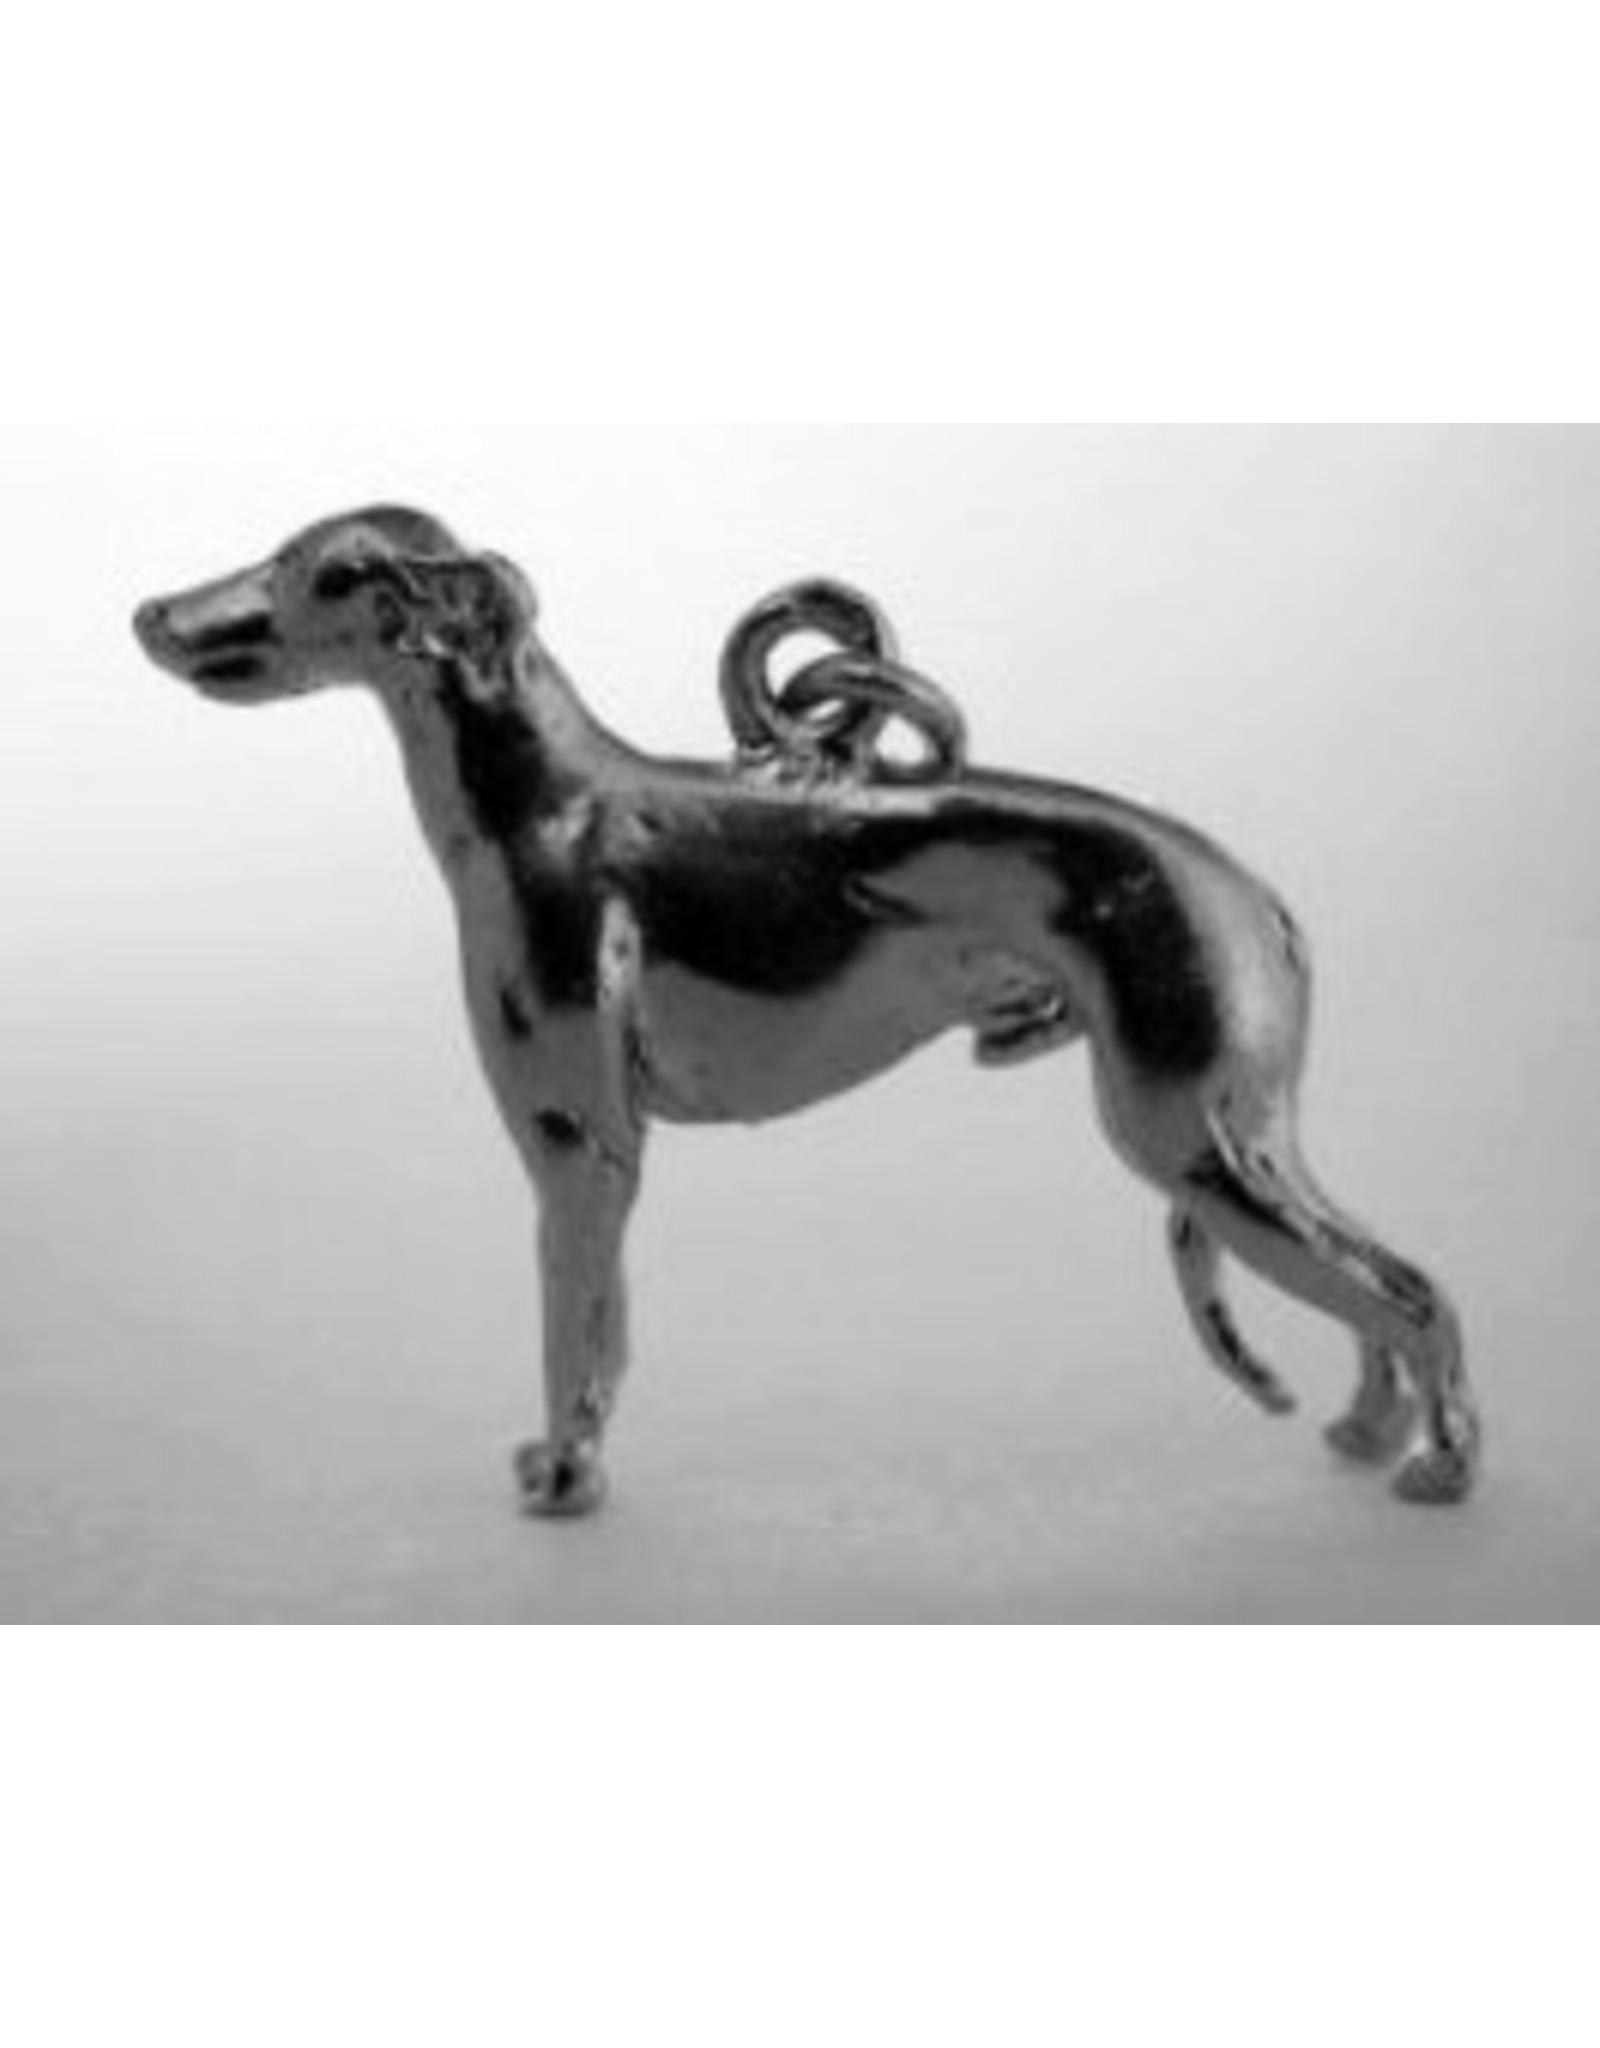 Handmade by Hanneke Weigel Zilveren Galgo espanol